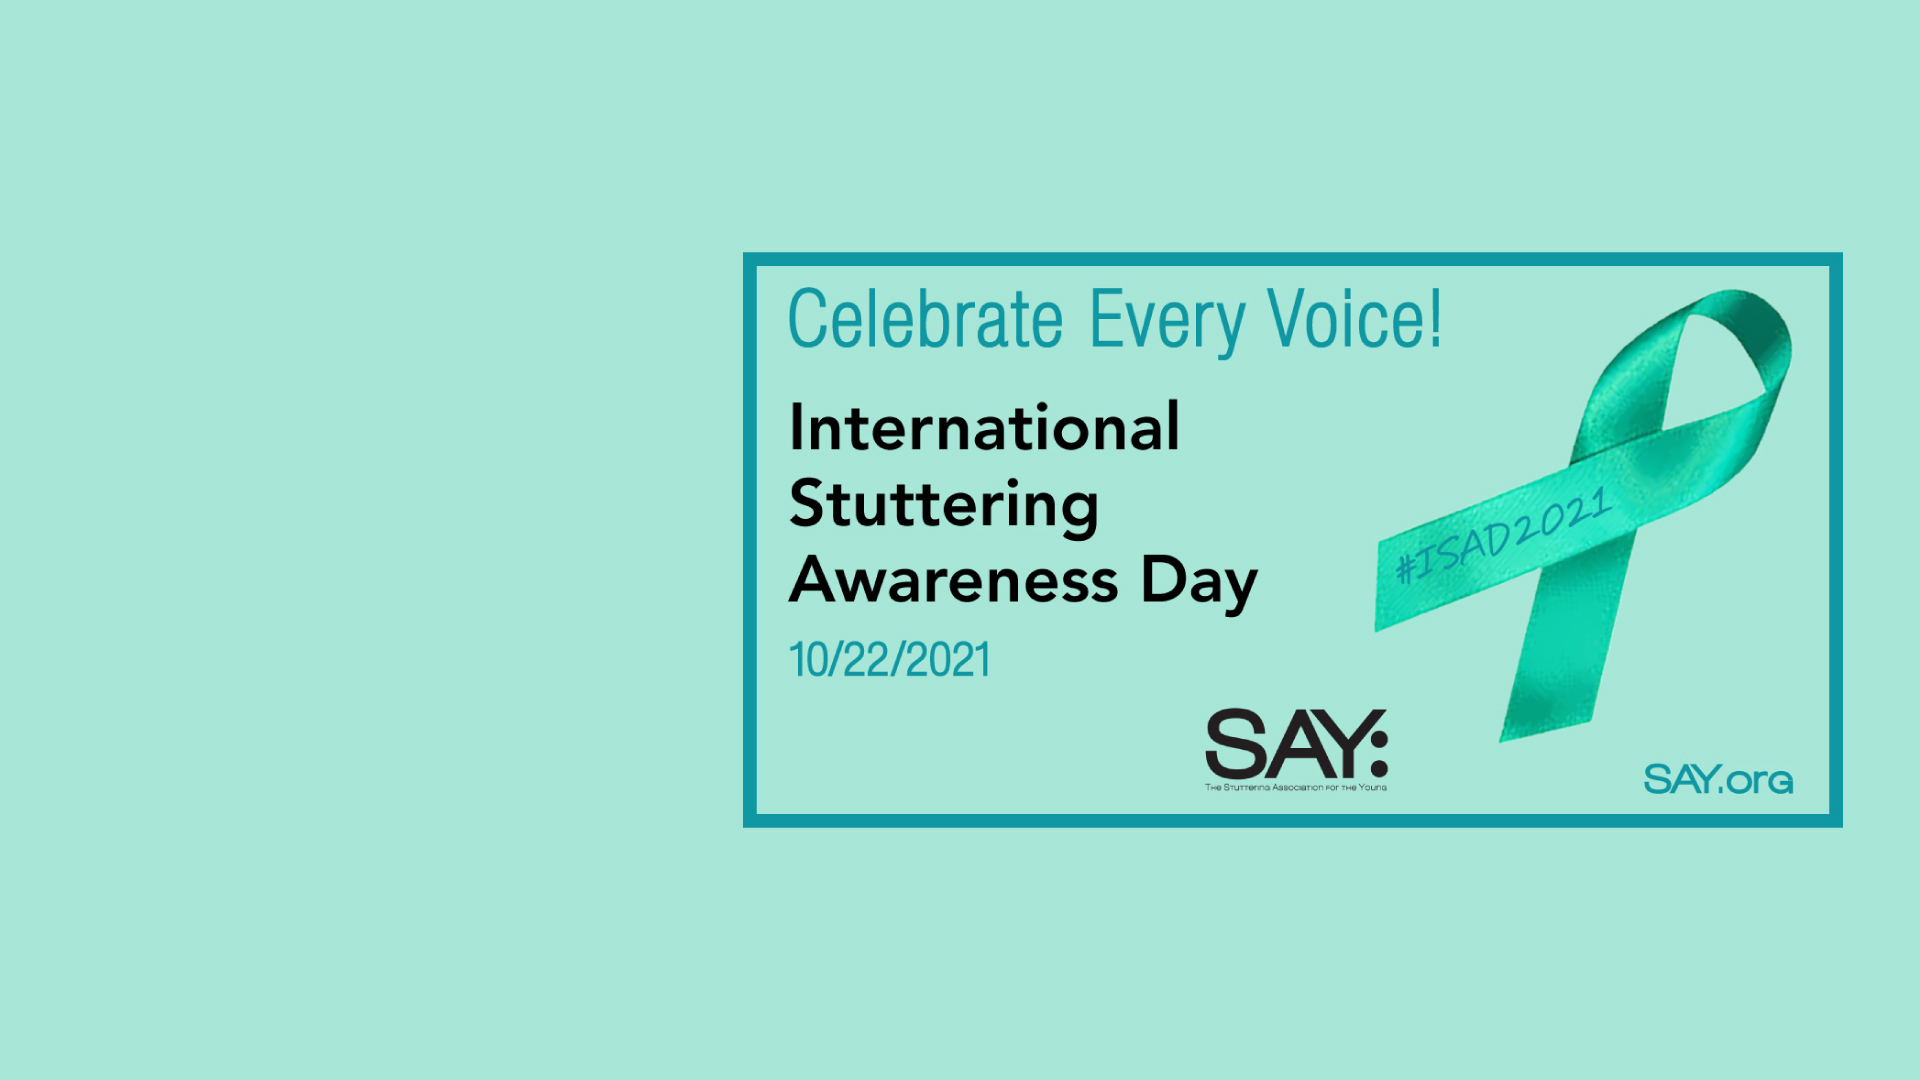 Join the ISAD 2021 Celebration!